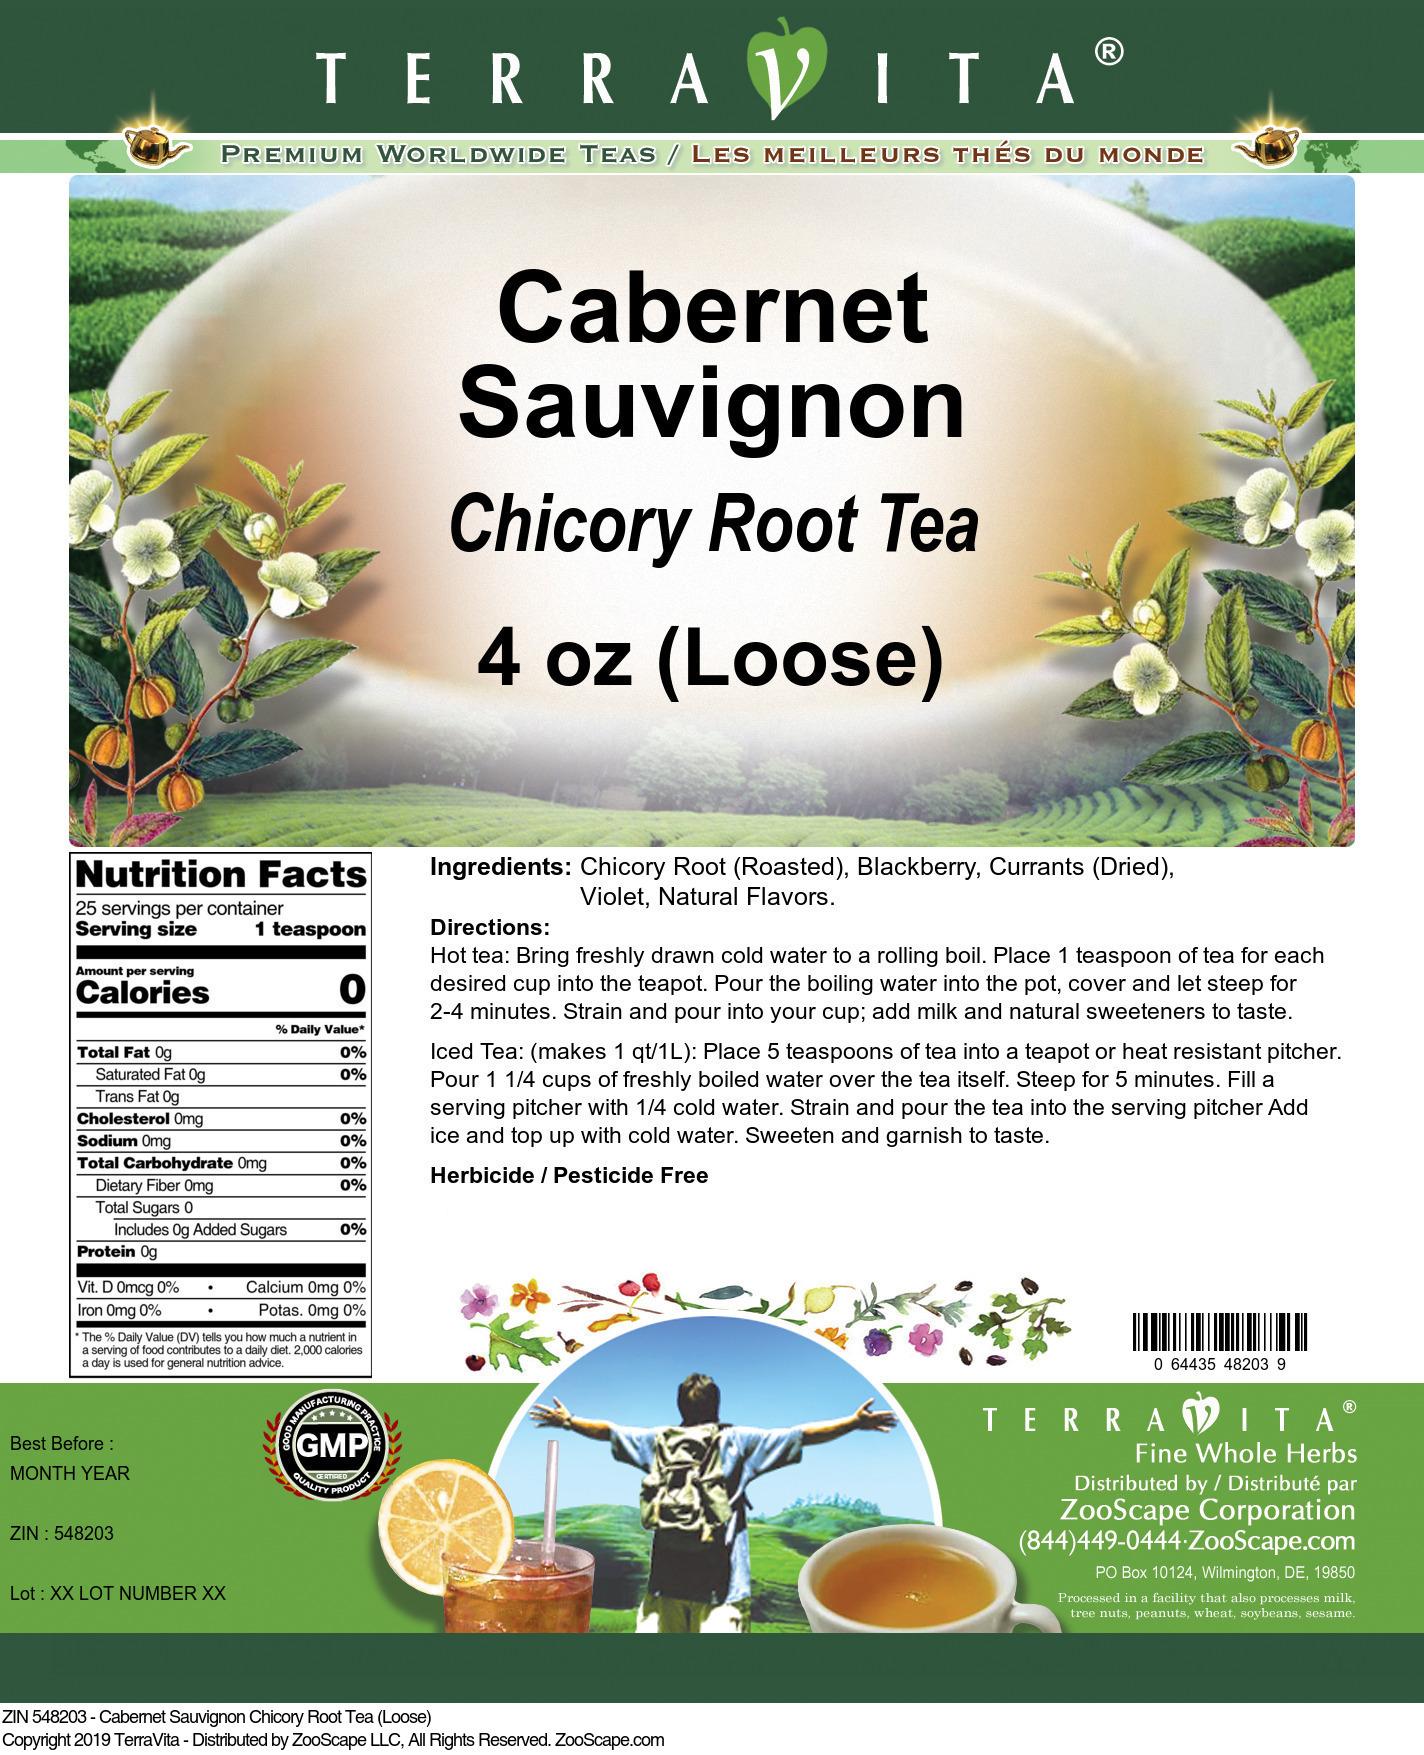 Cabernet Sauvignon Chicory Root Tea (Loose)